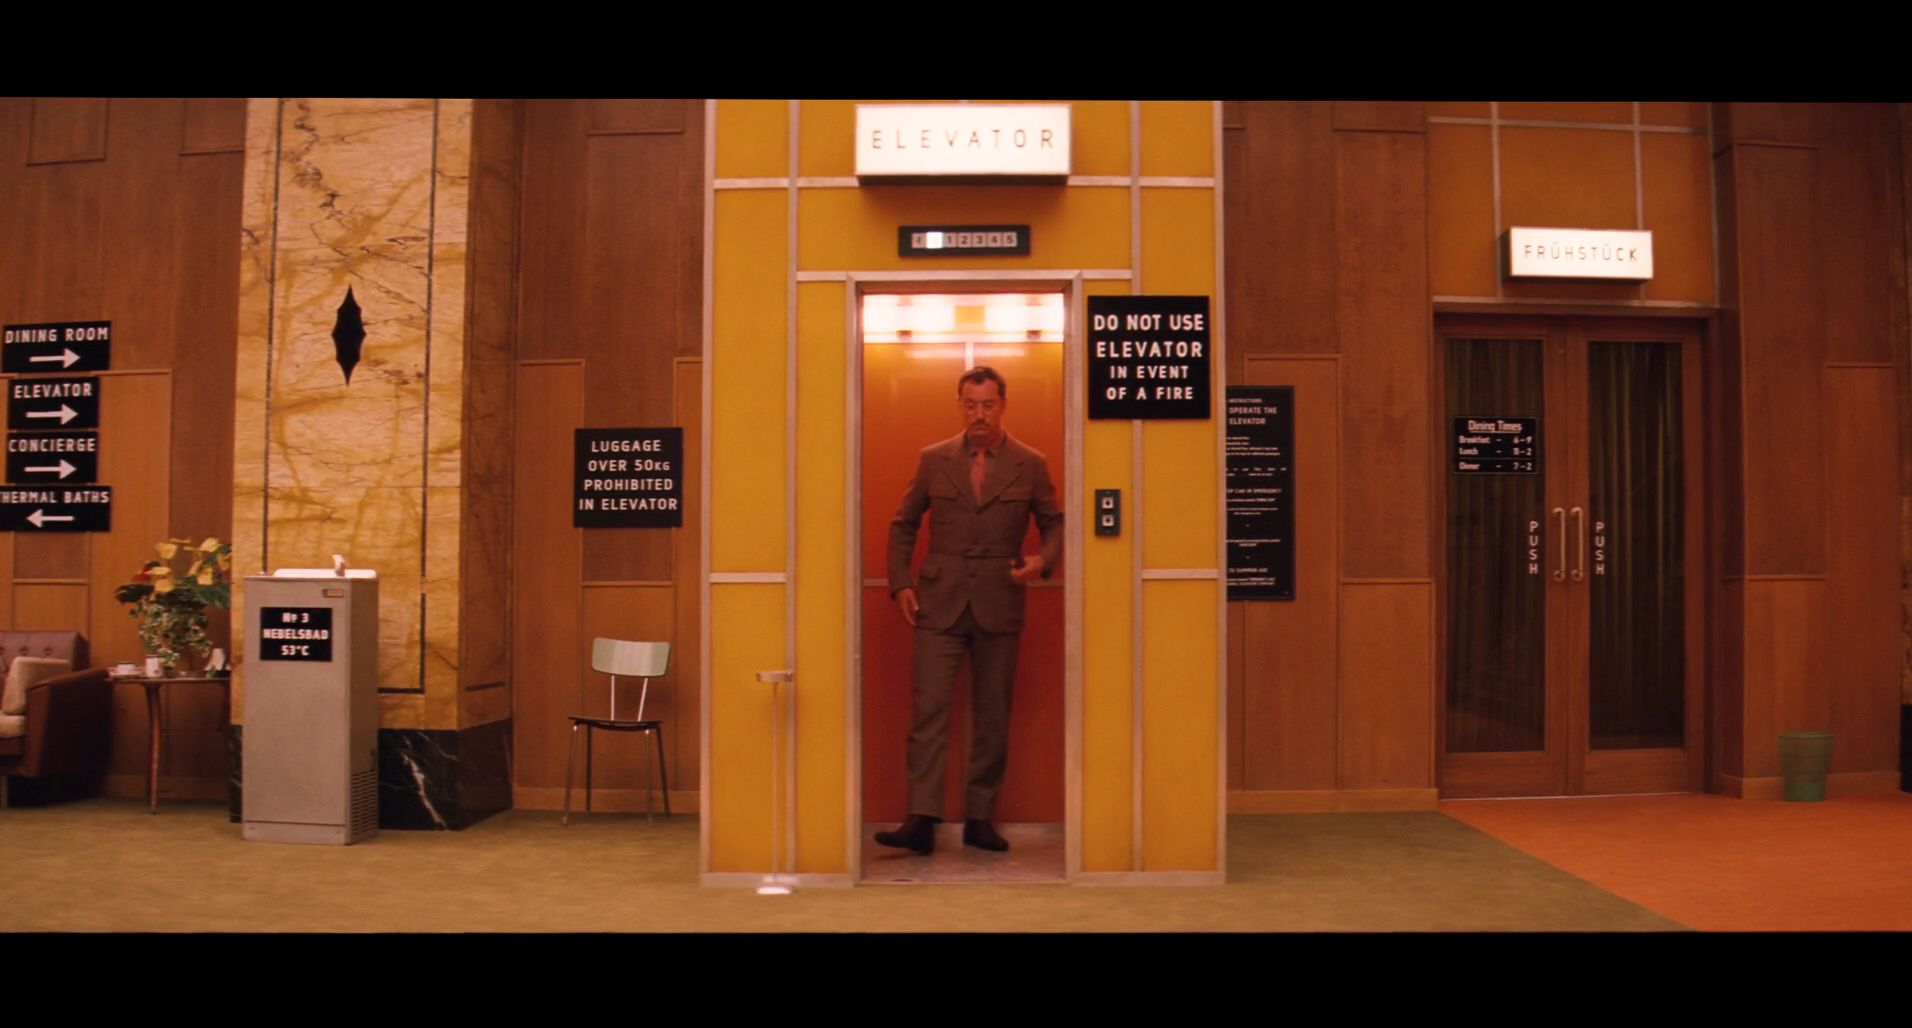 Grand Budapest Hotel The Granbuda 0141 High Quality Movie Screencaps Gallery